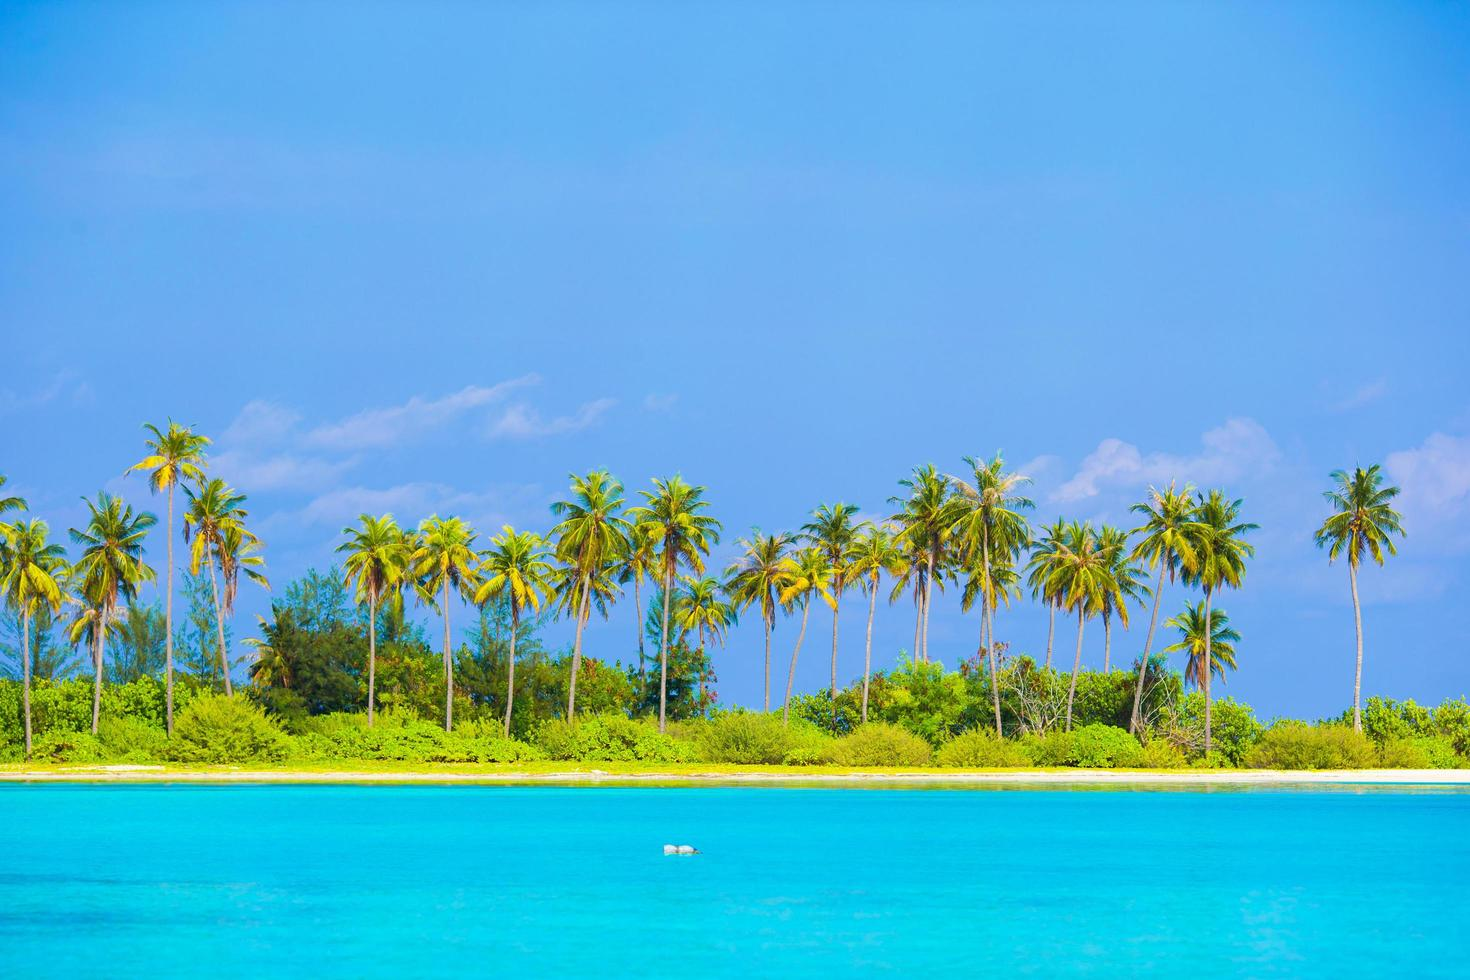 Tropical beach at daytime photo